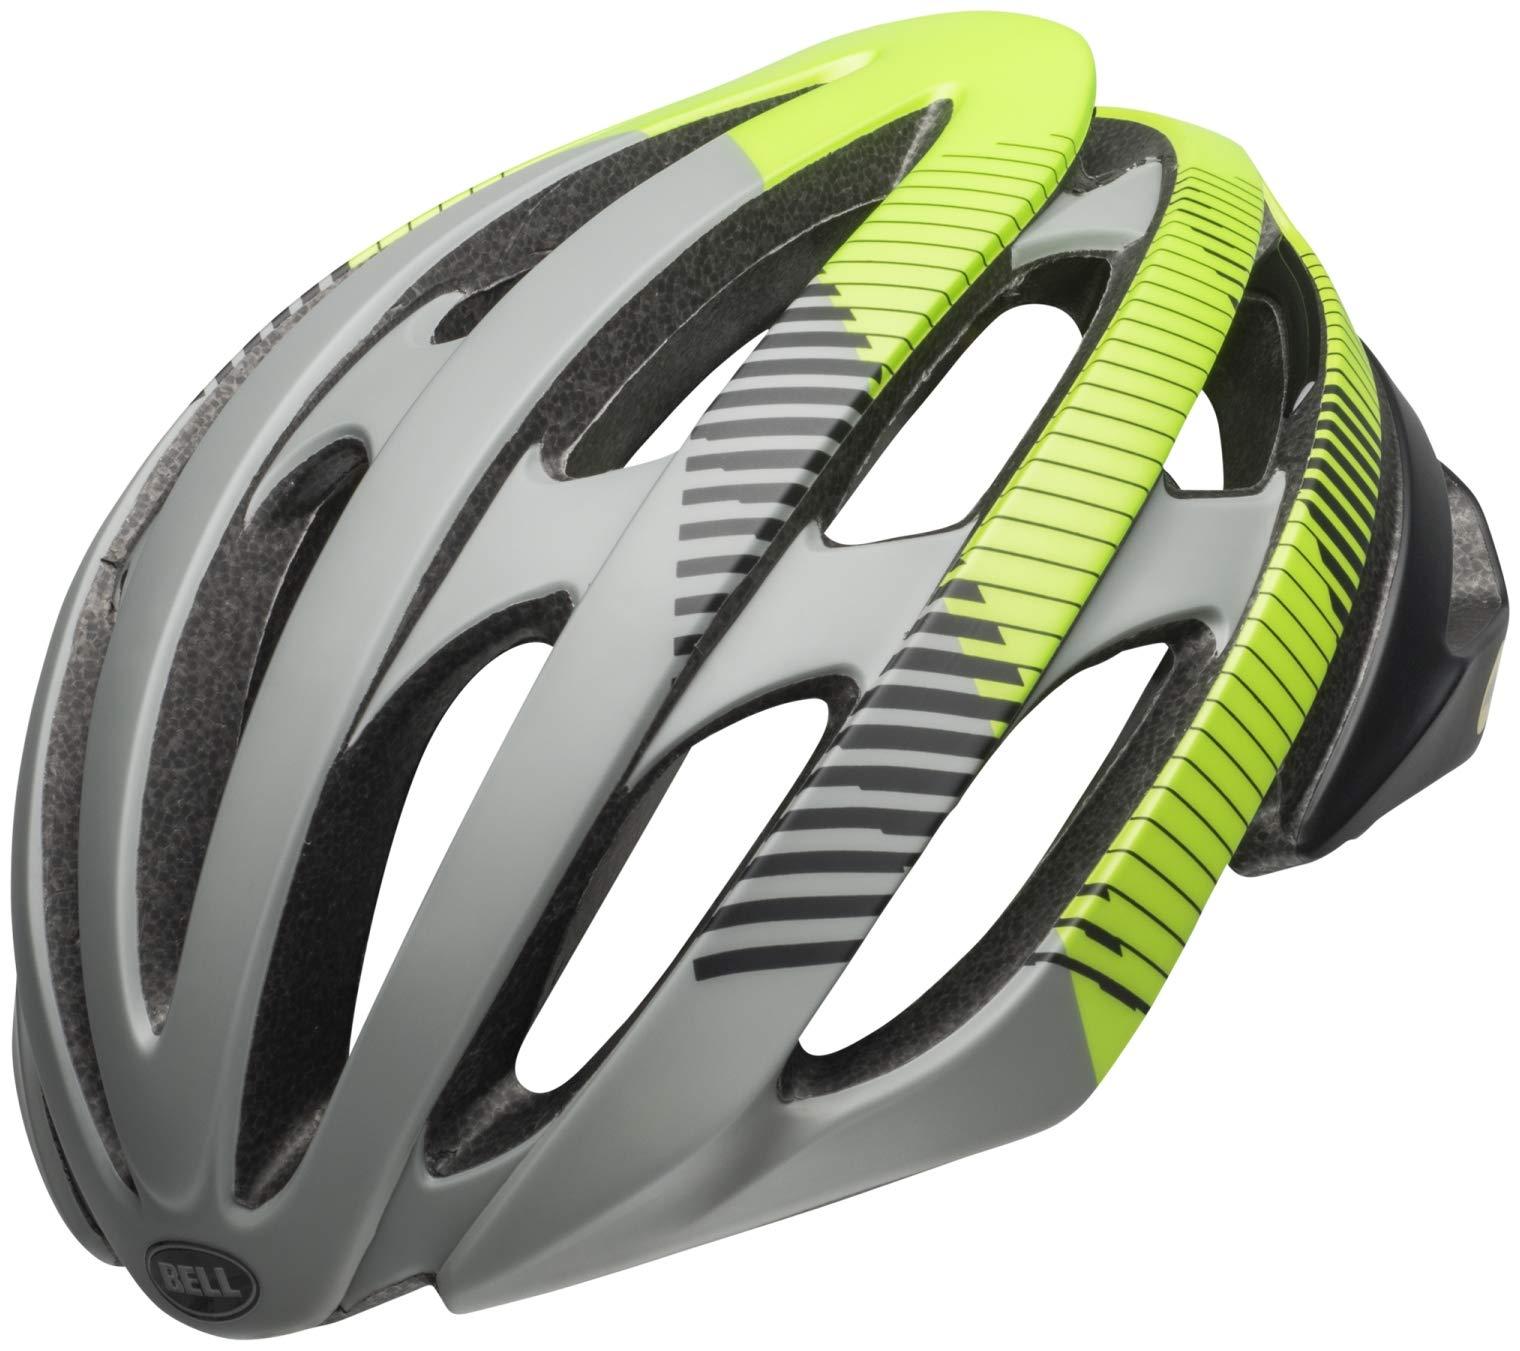 Bell Stratus MIPS Helmet Bluster Matte Dark Gray/Black/Lemon, L